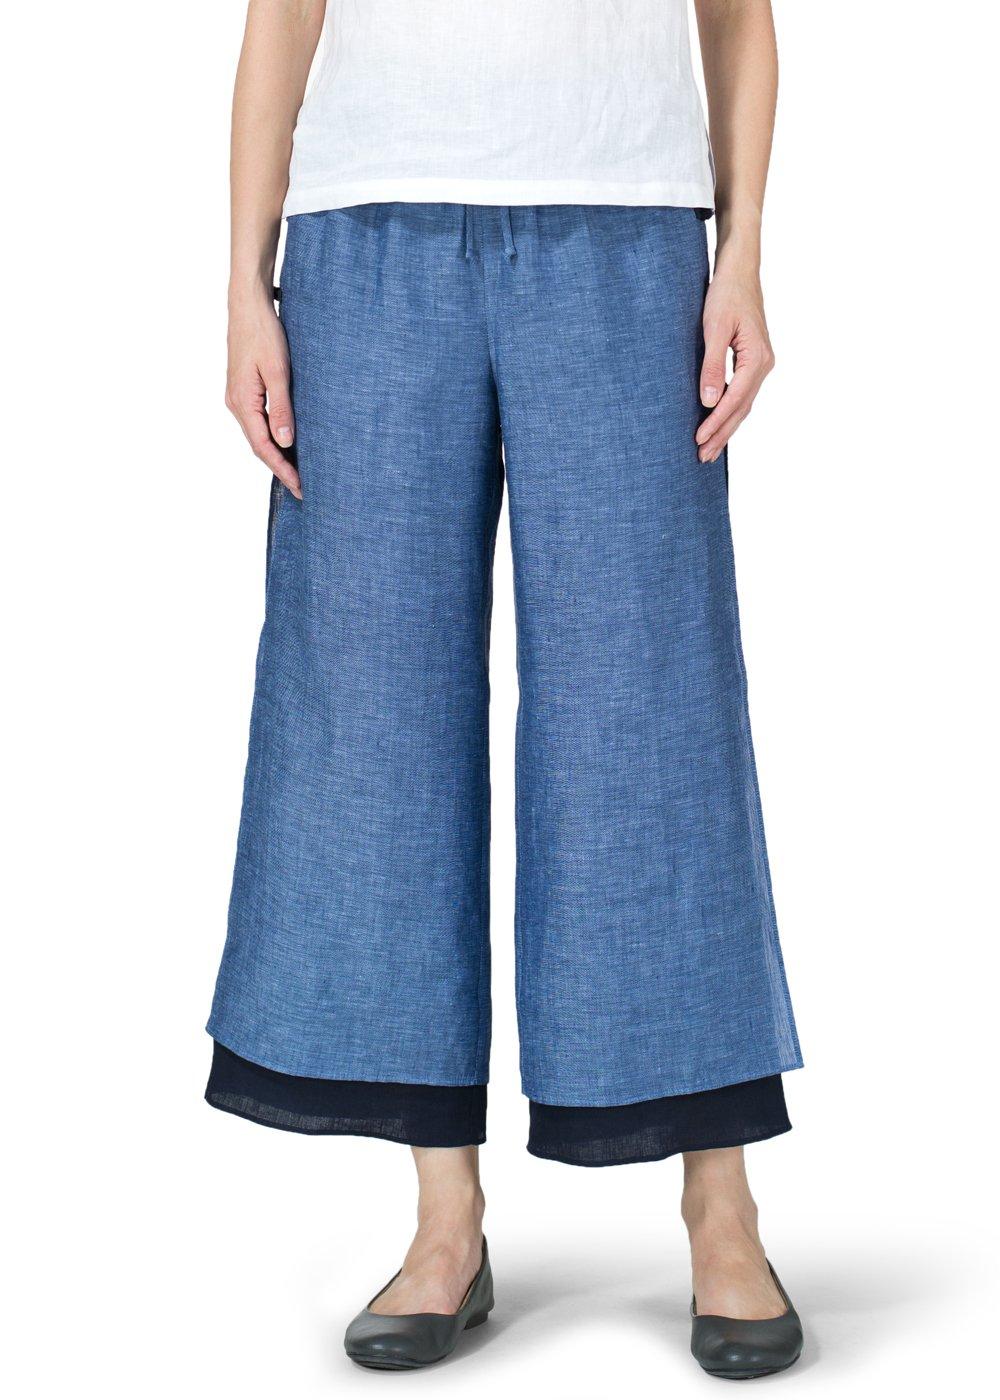 Vivid Linen Double Layer Cropped Pants-1X-Azure Blue/Navy